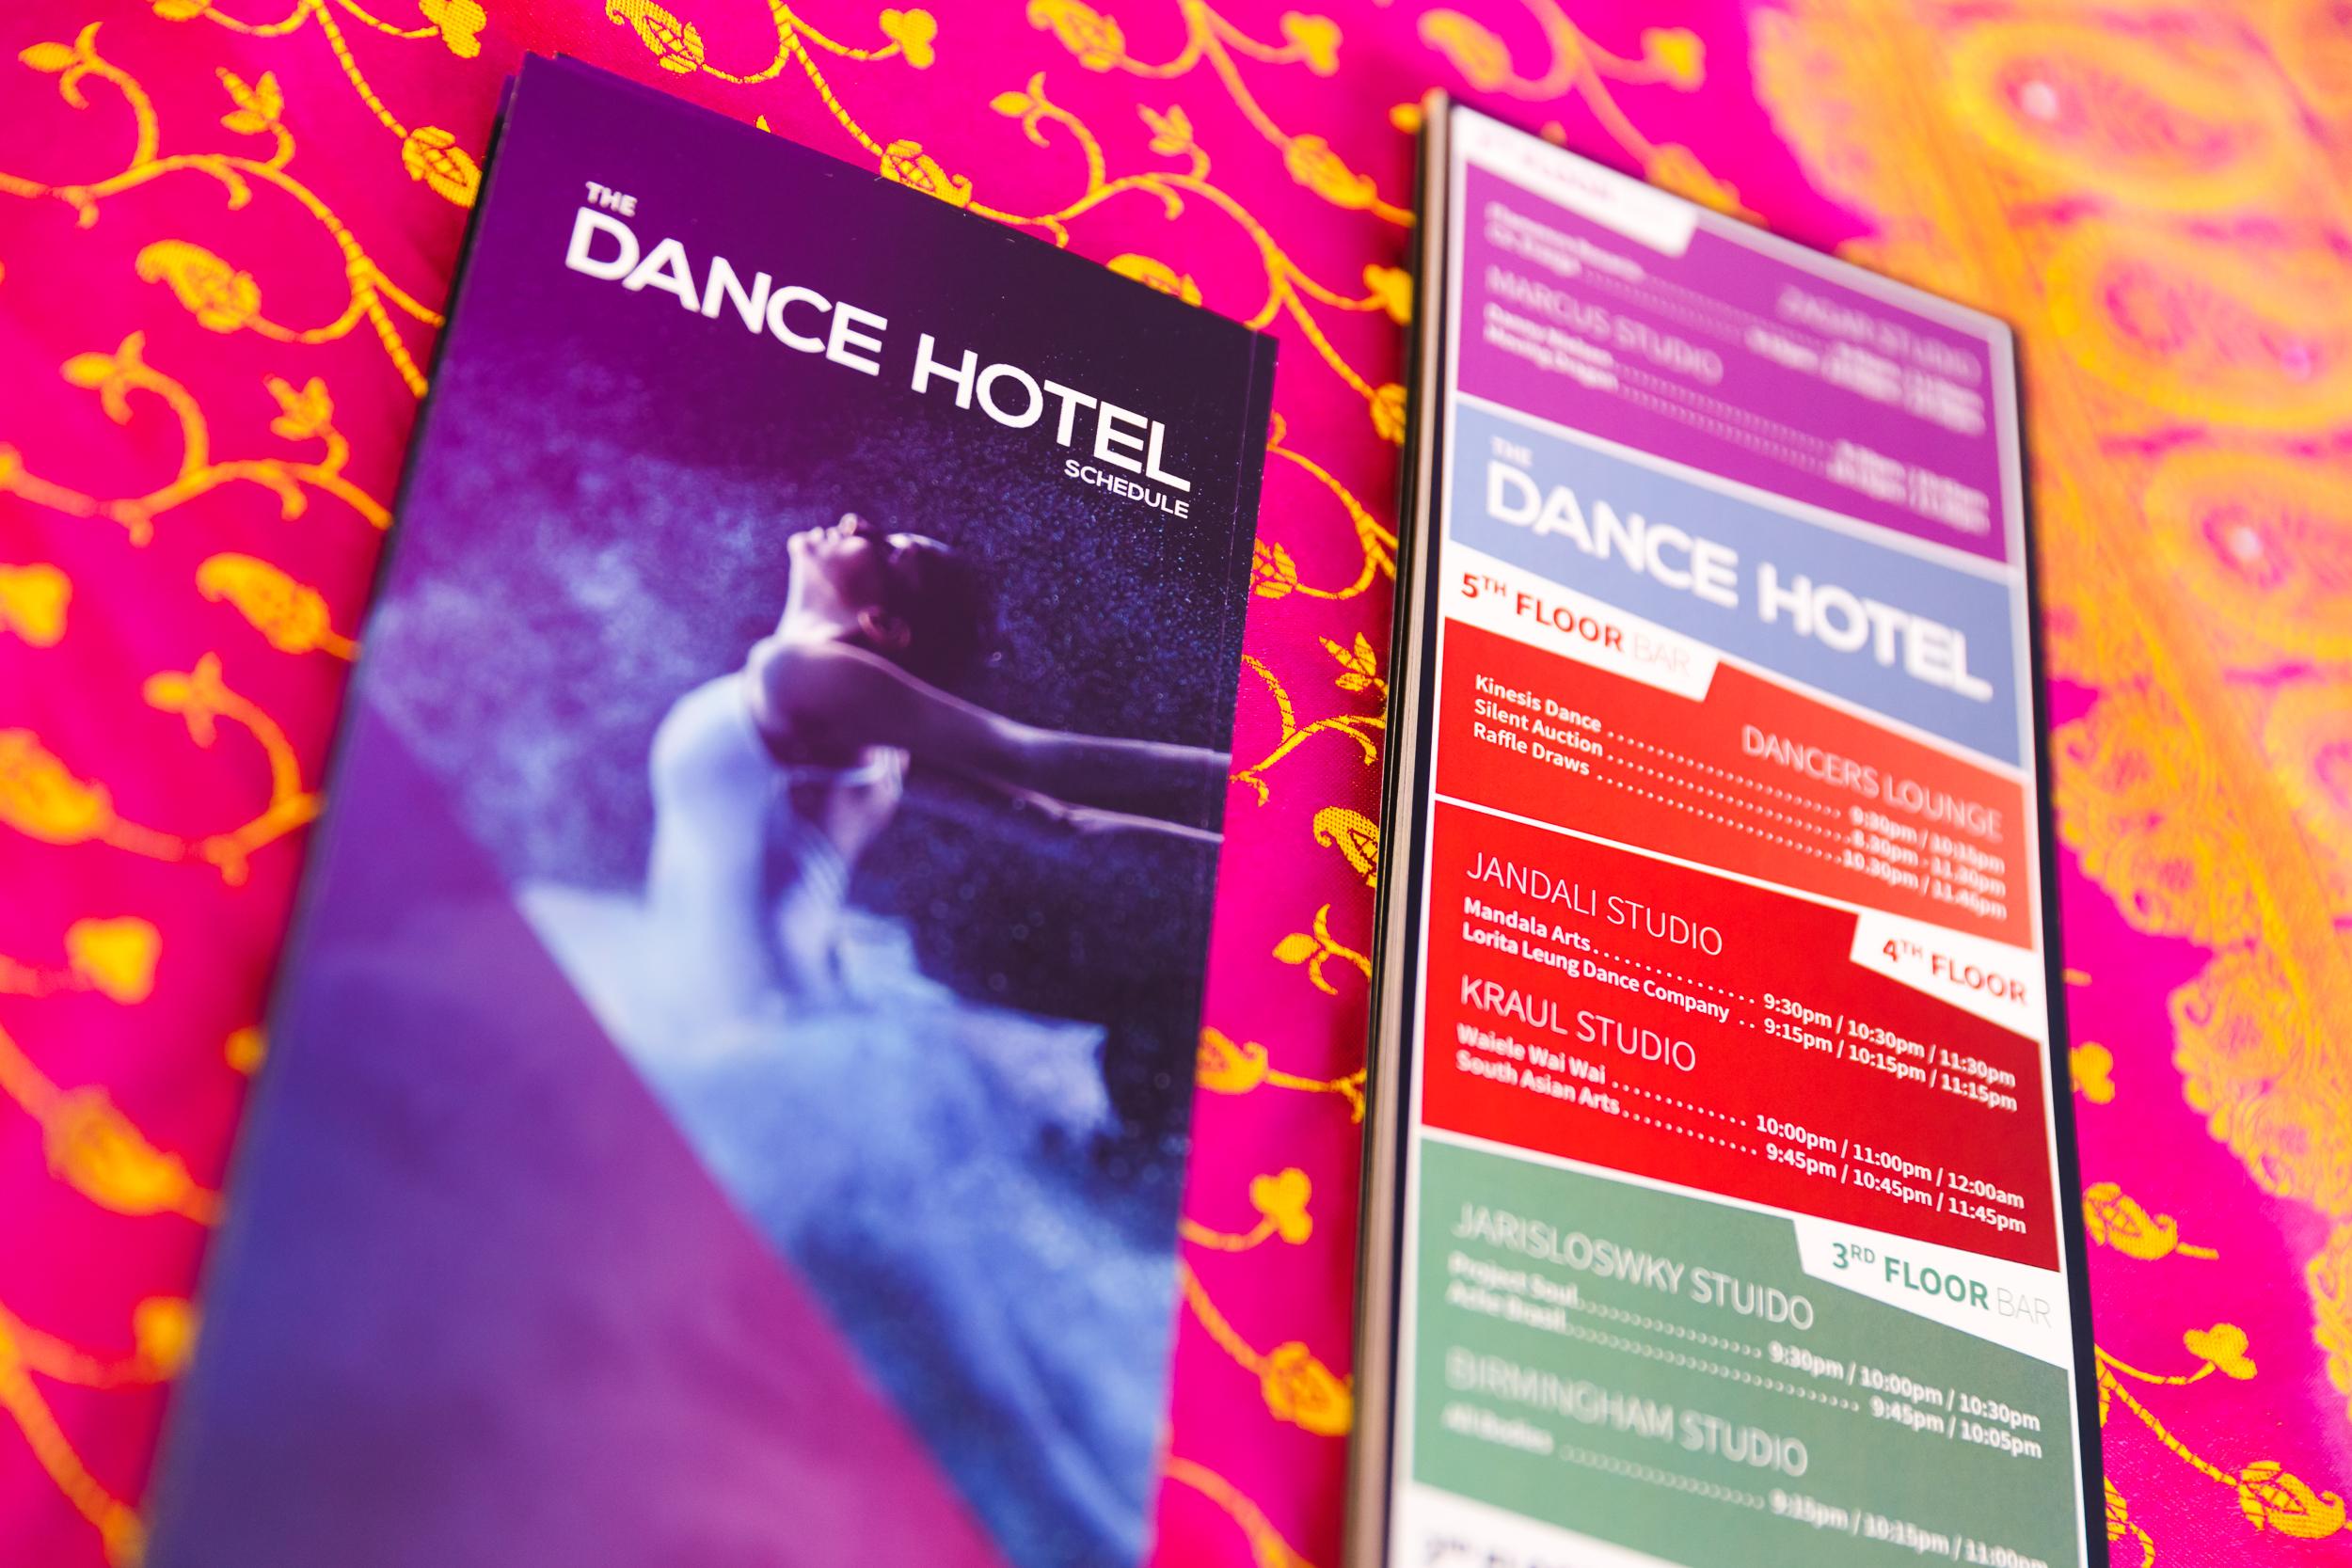 Scotiabank-Dance-Hotel-image1.jpg